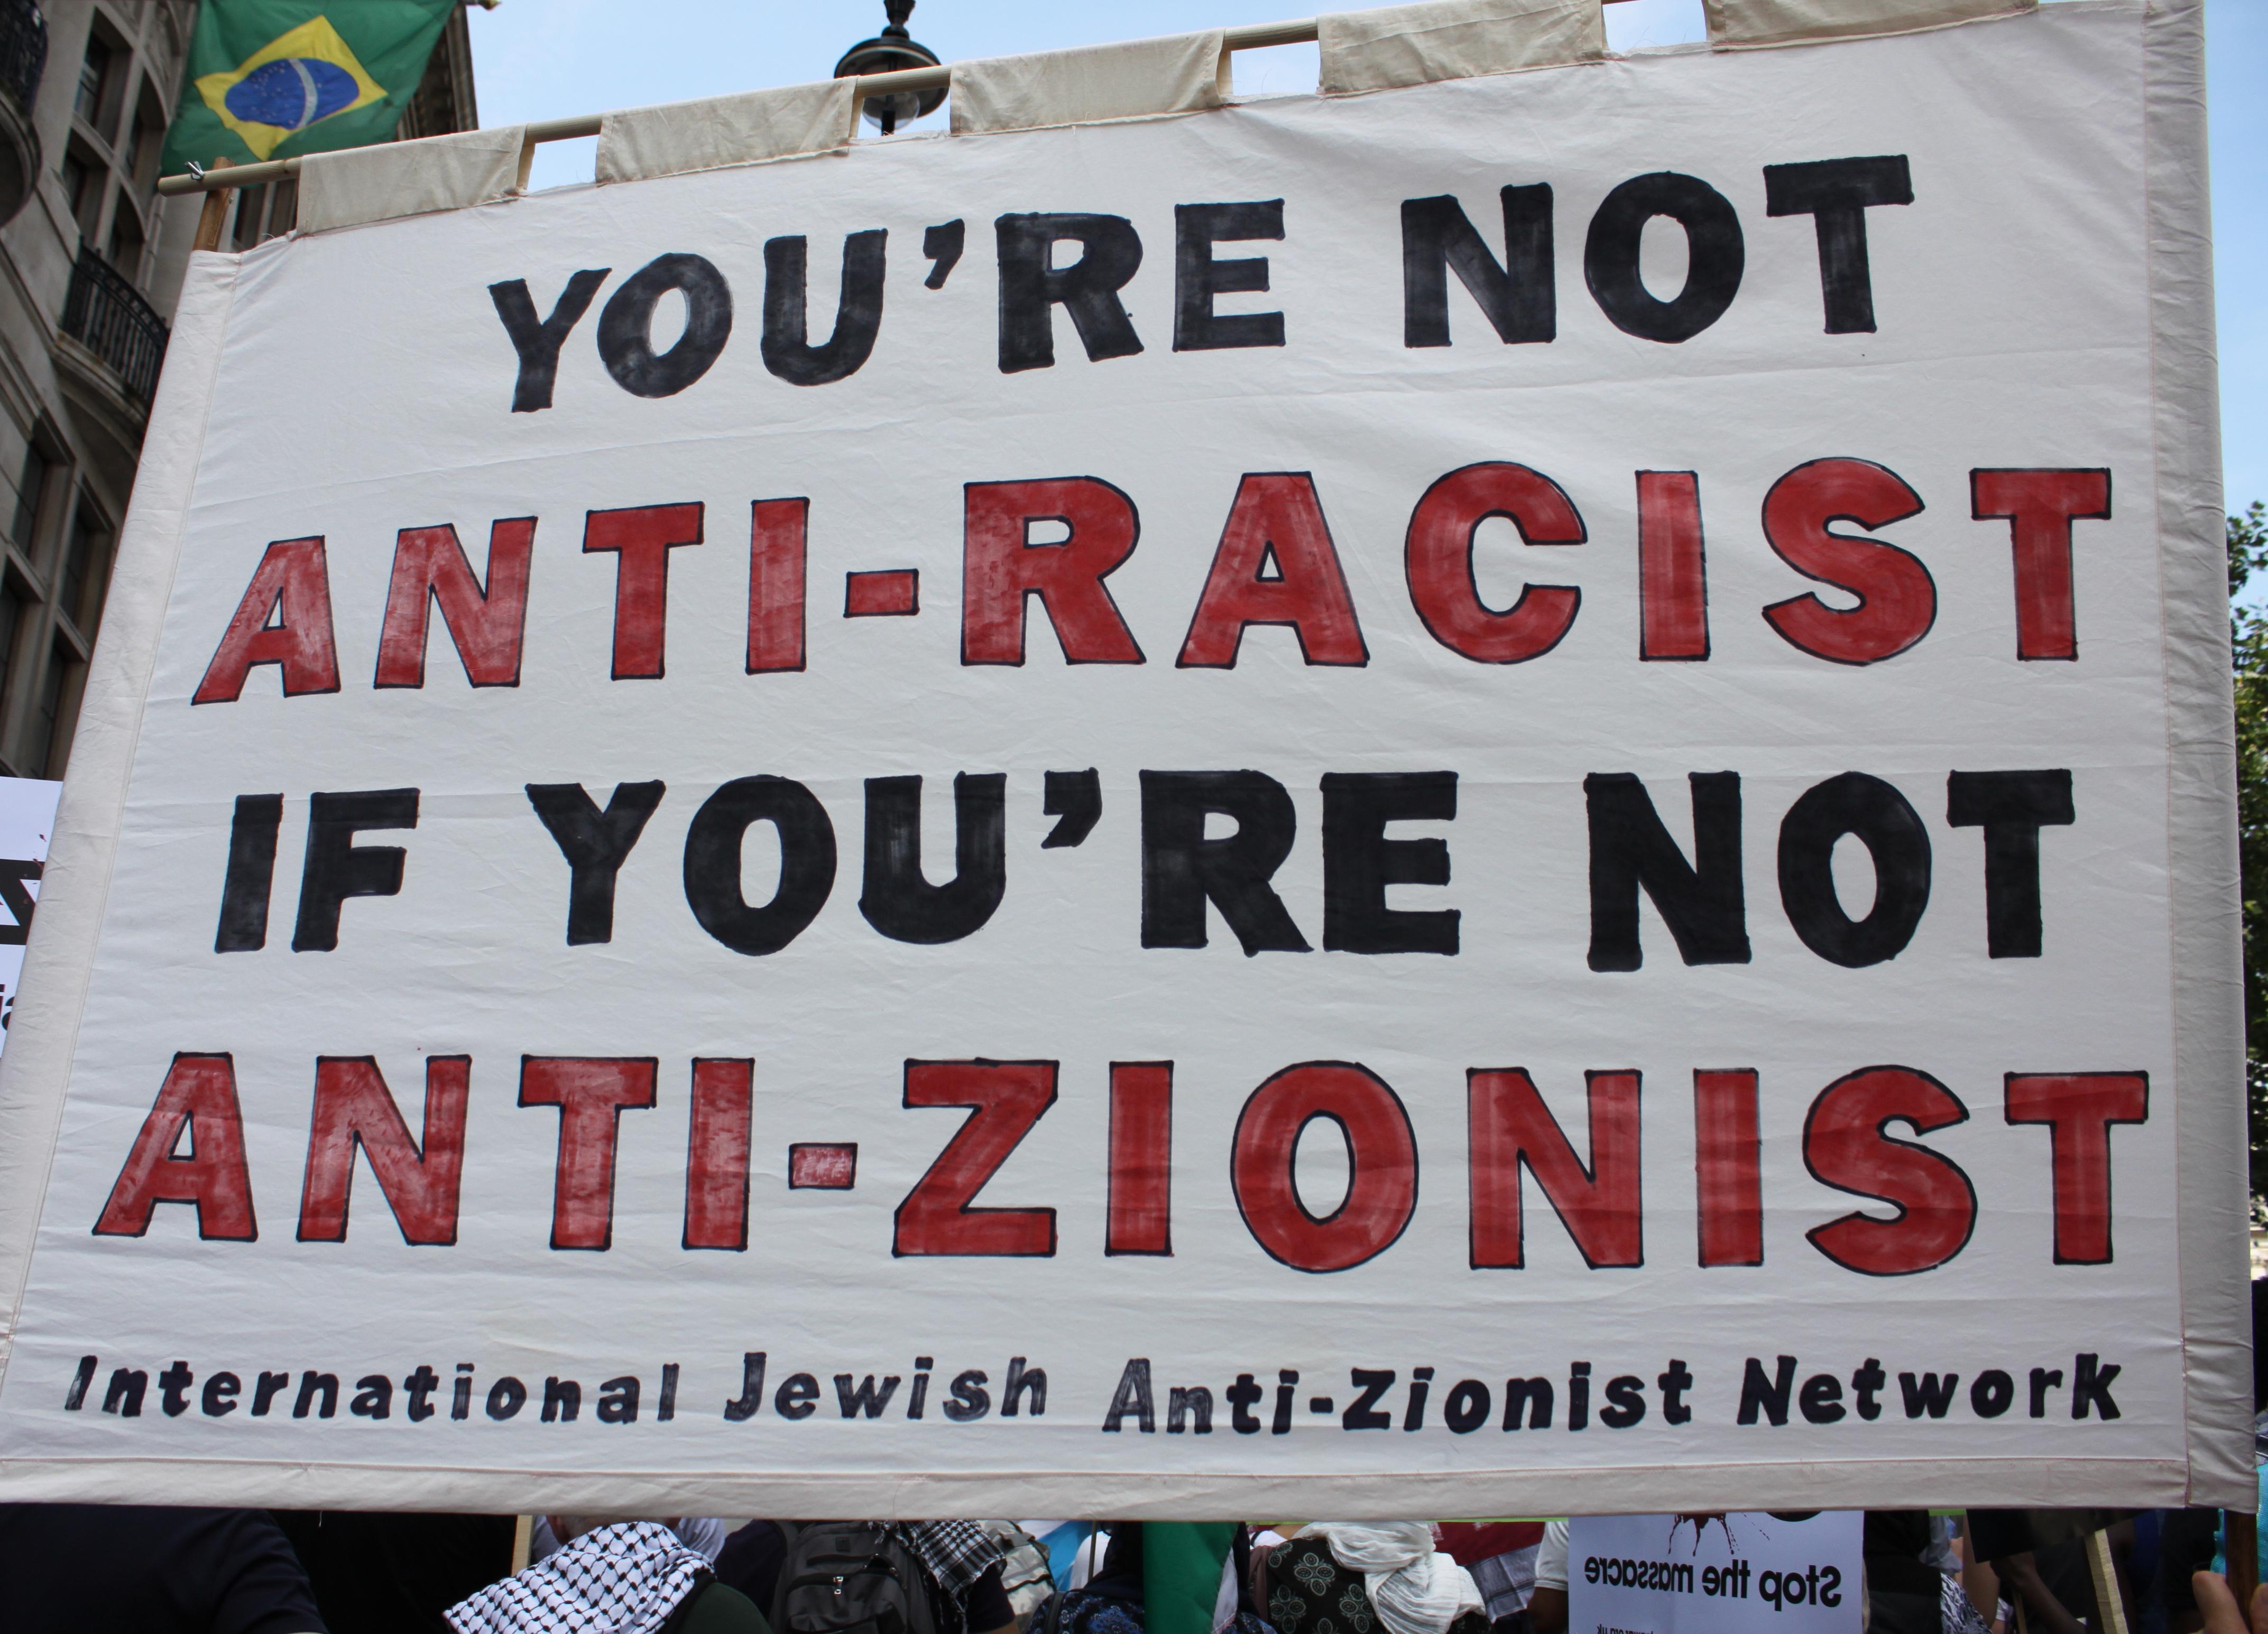 Protest by the International Jewish Anti-Zionist Network (IJAN)